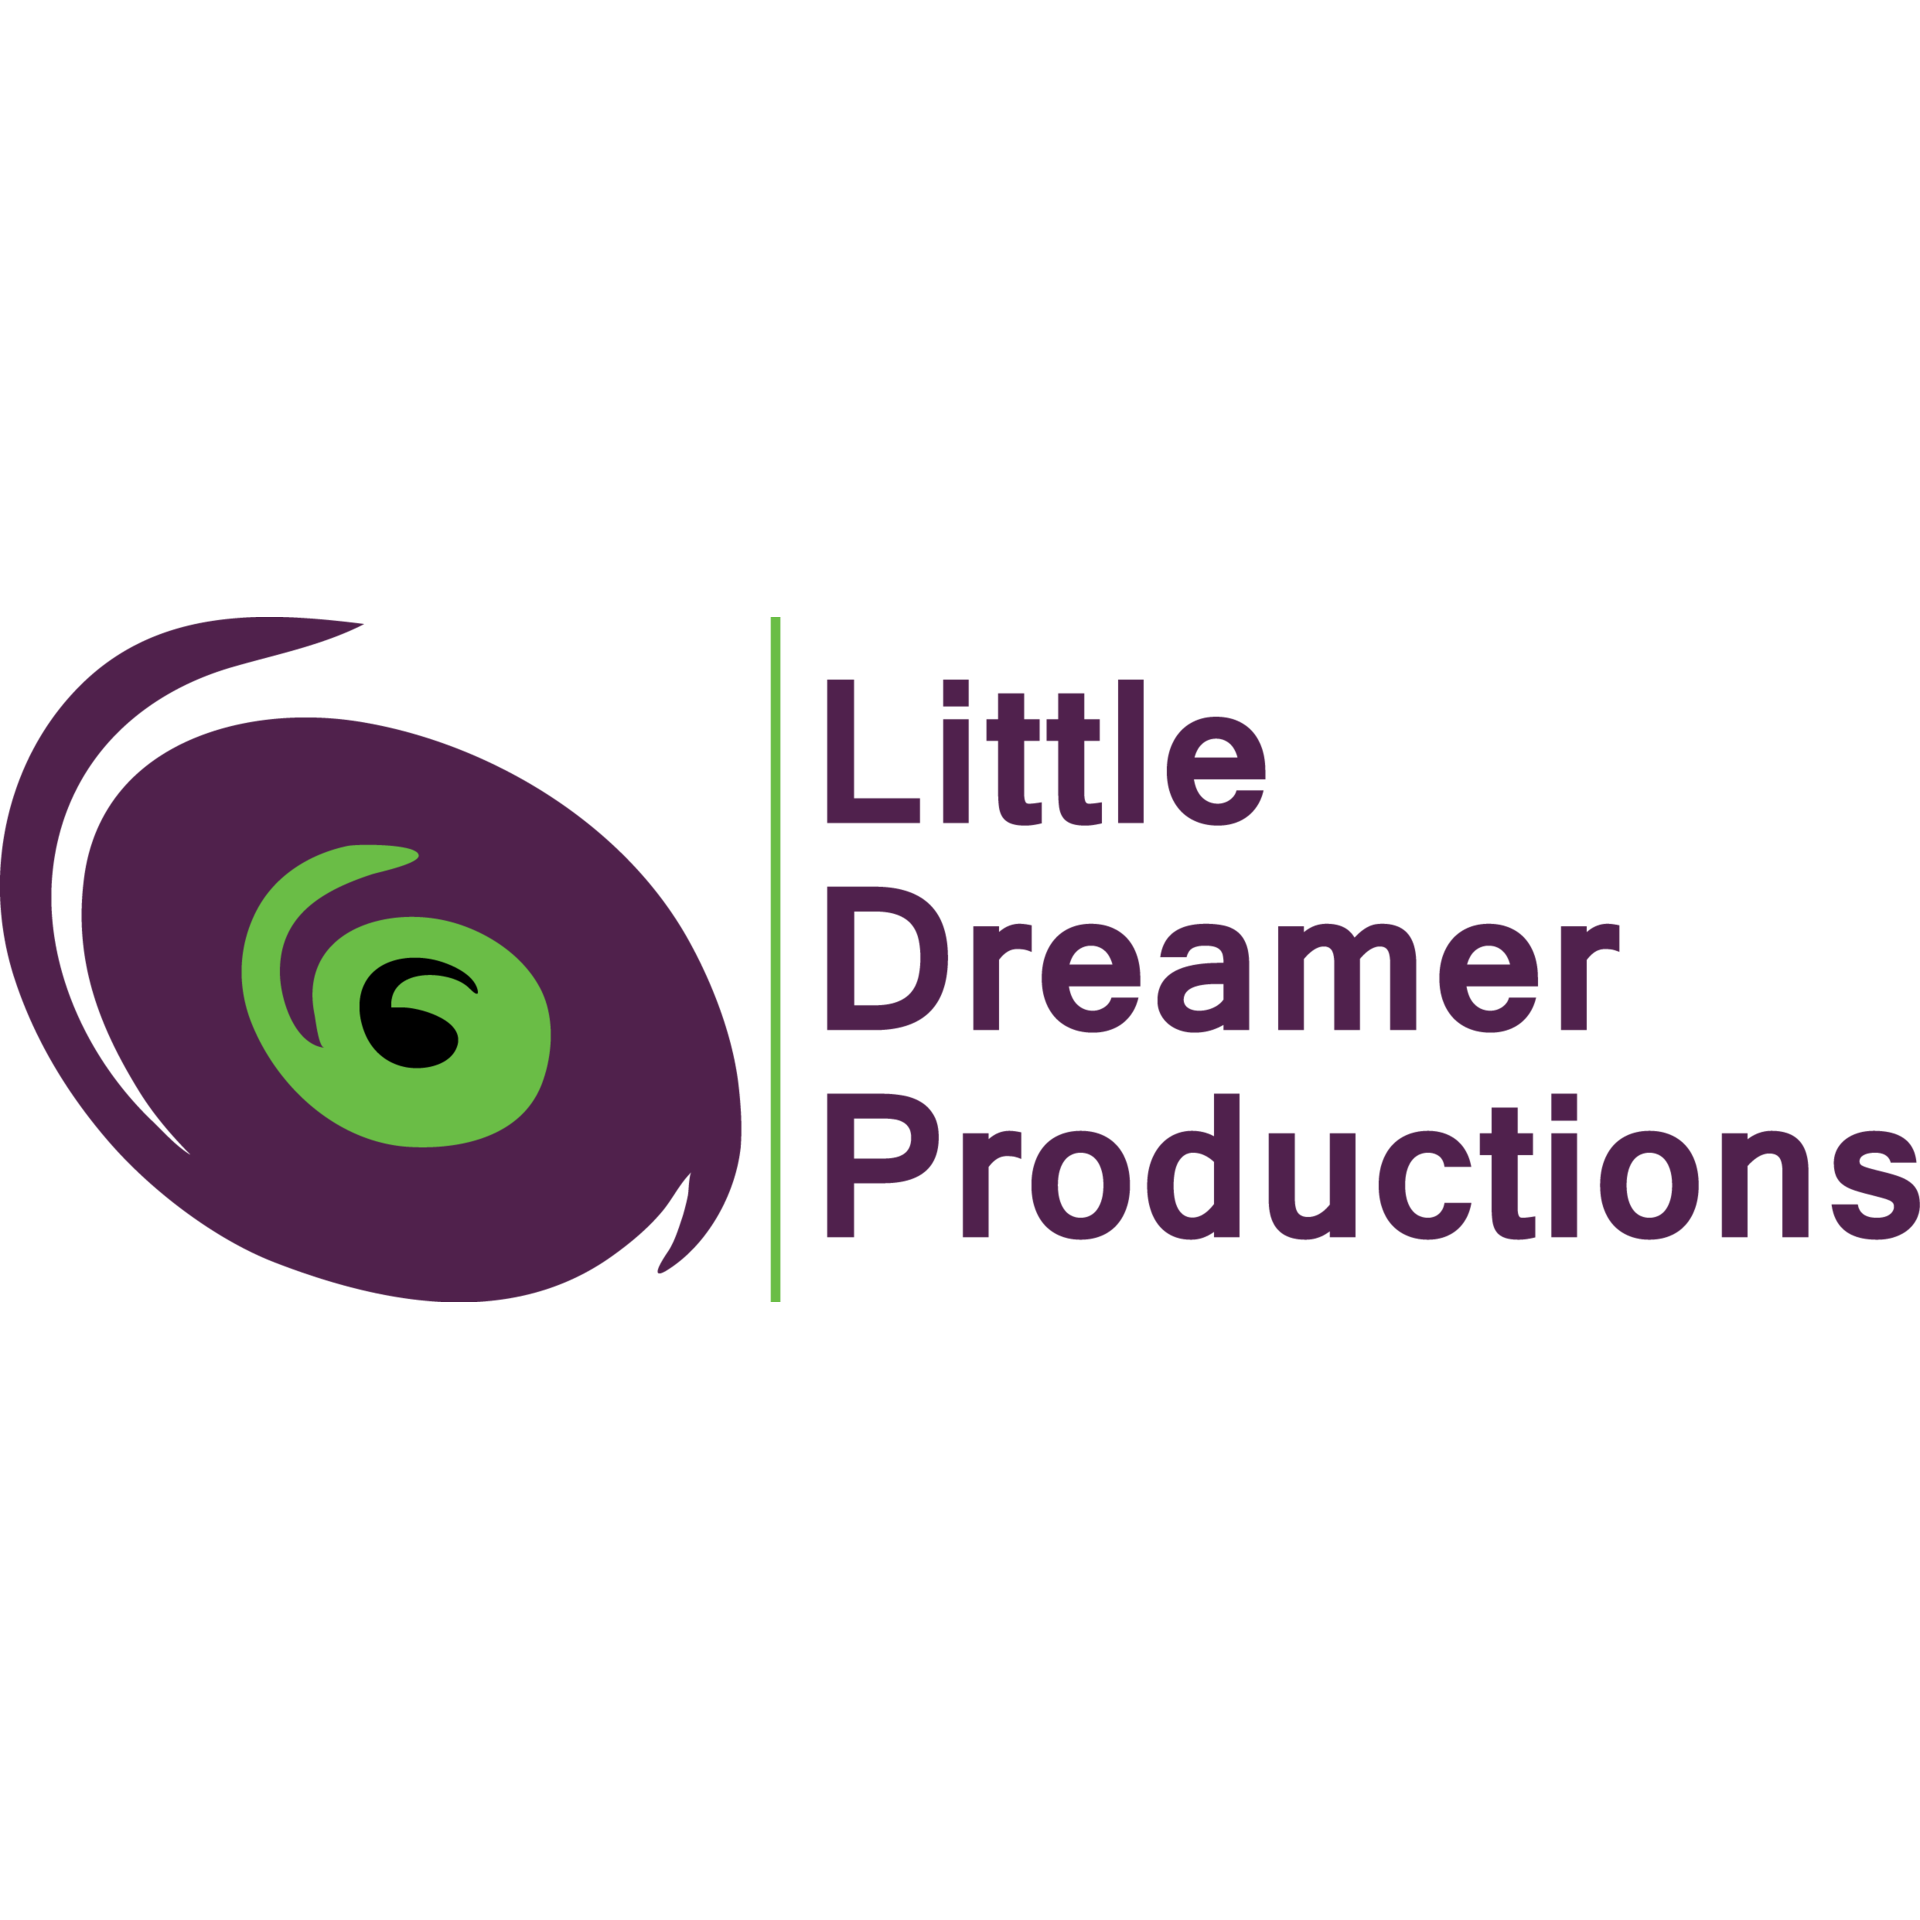 Little Dreamer Productions